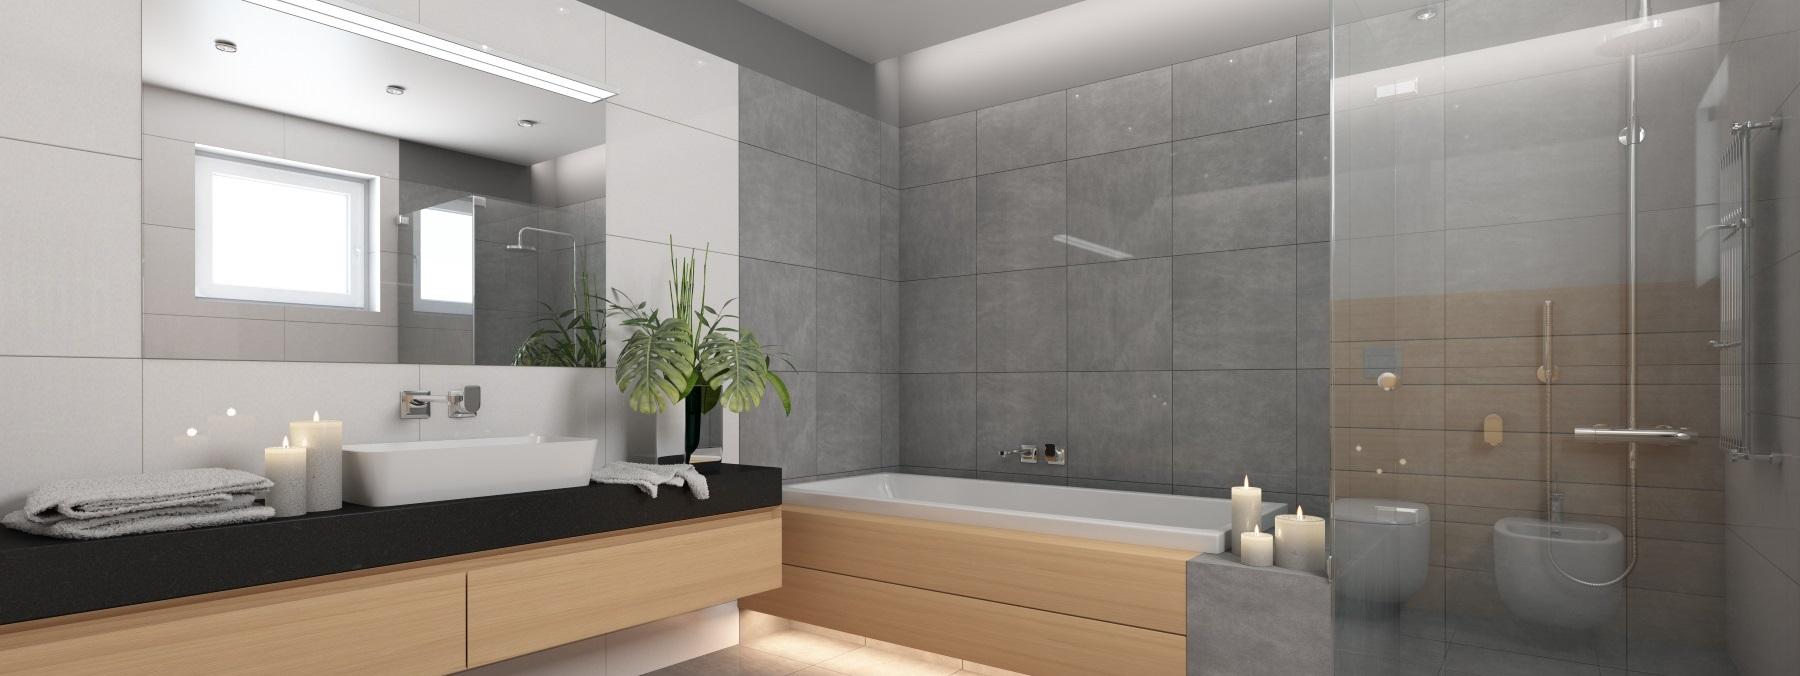 Premium Quality Castle Hill Bathroom Renovations